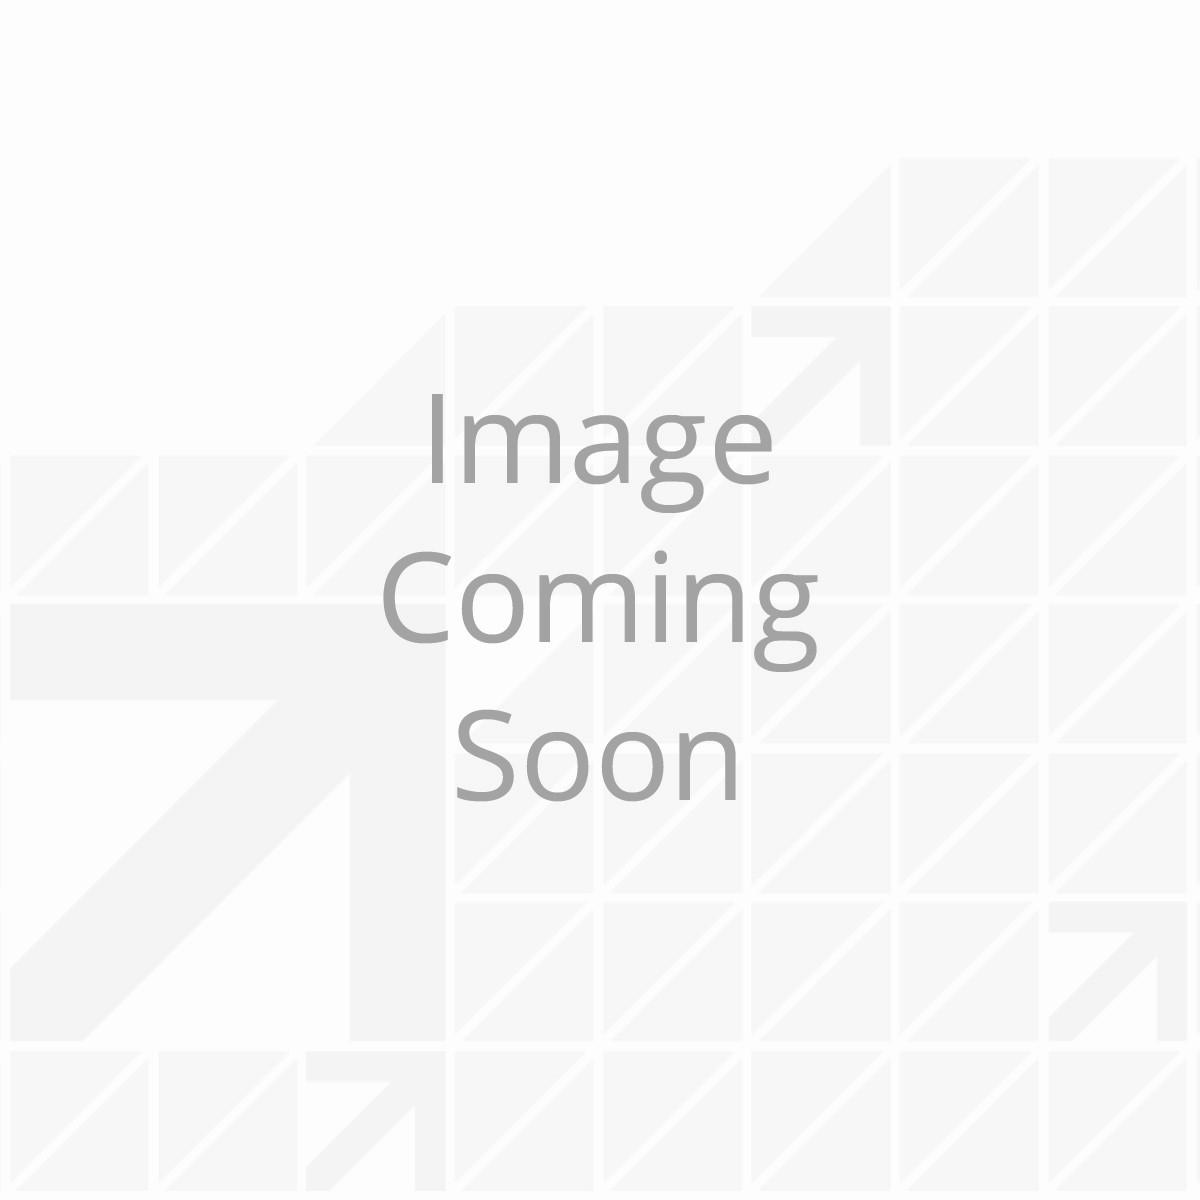 238461_Torque-Shaft_001